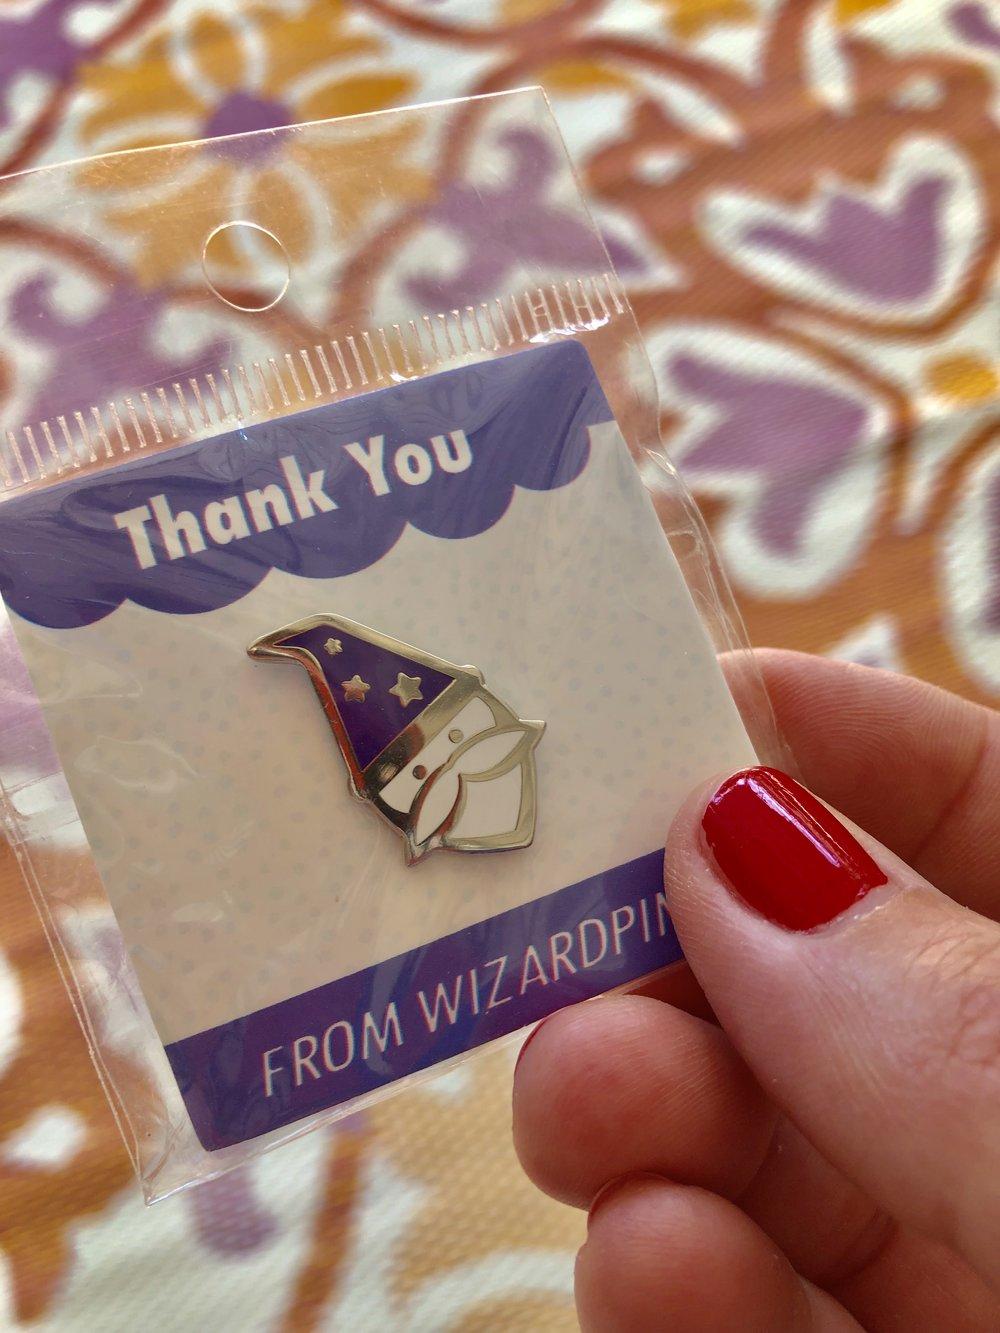 Wizardpins.com